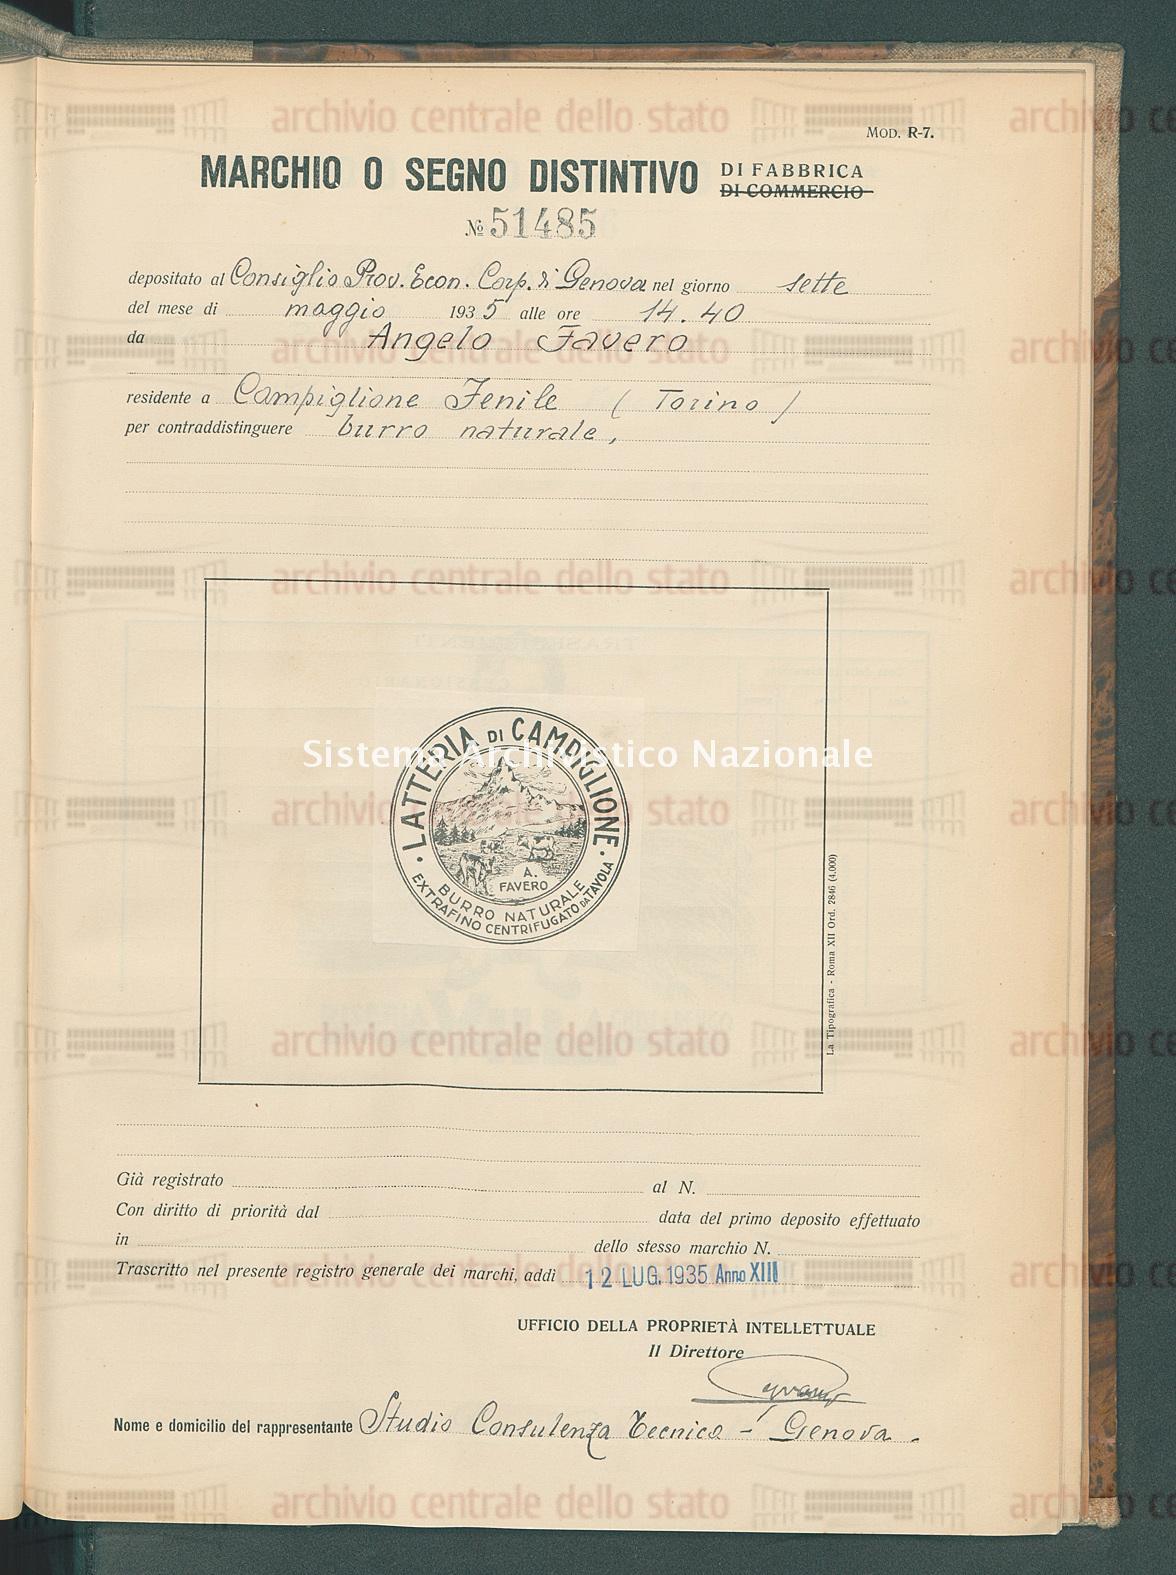 Burro naturale. Angelo Favero (12/07/1935)